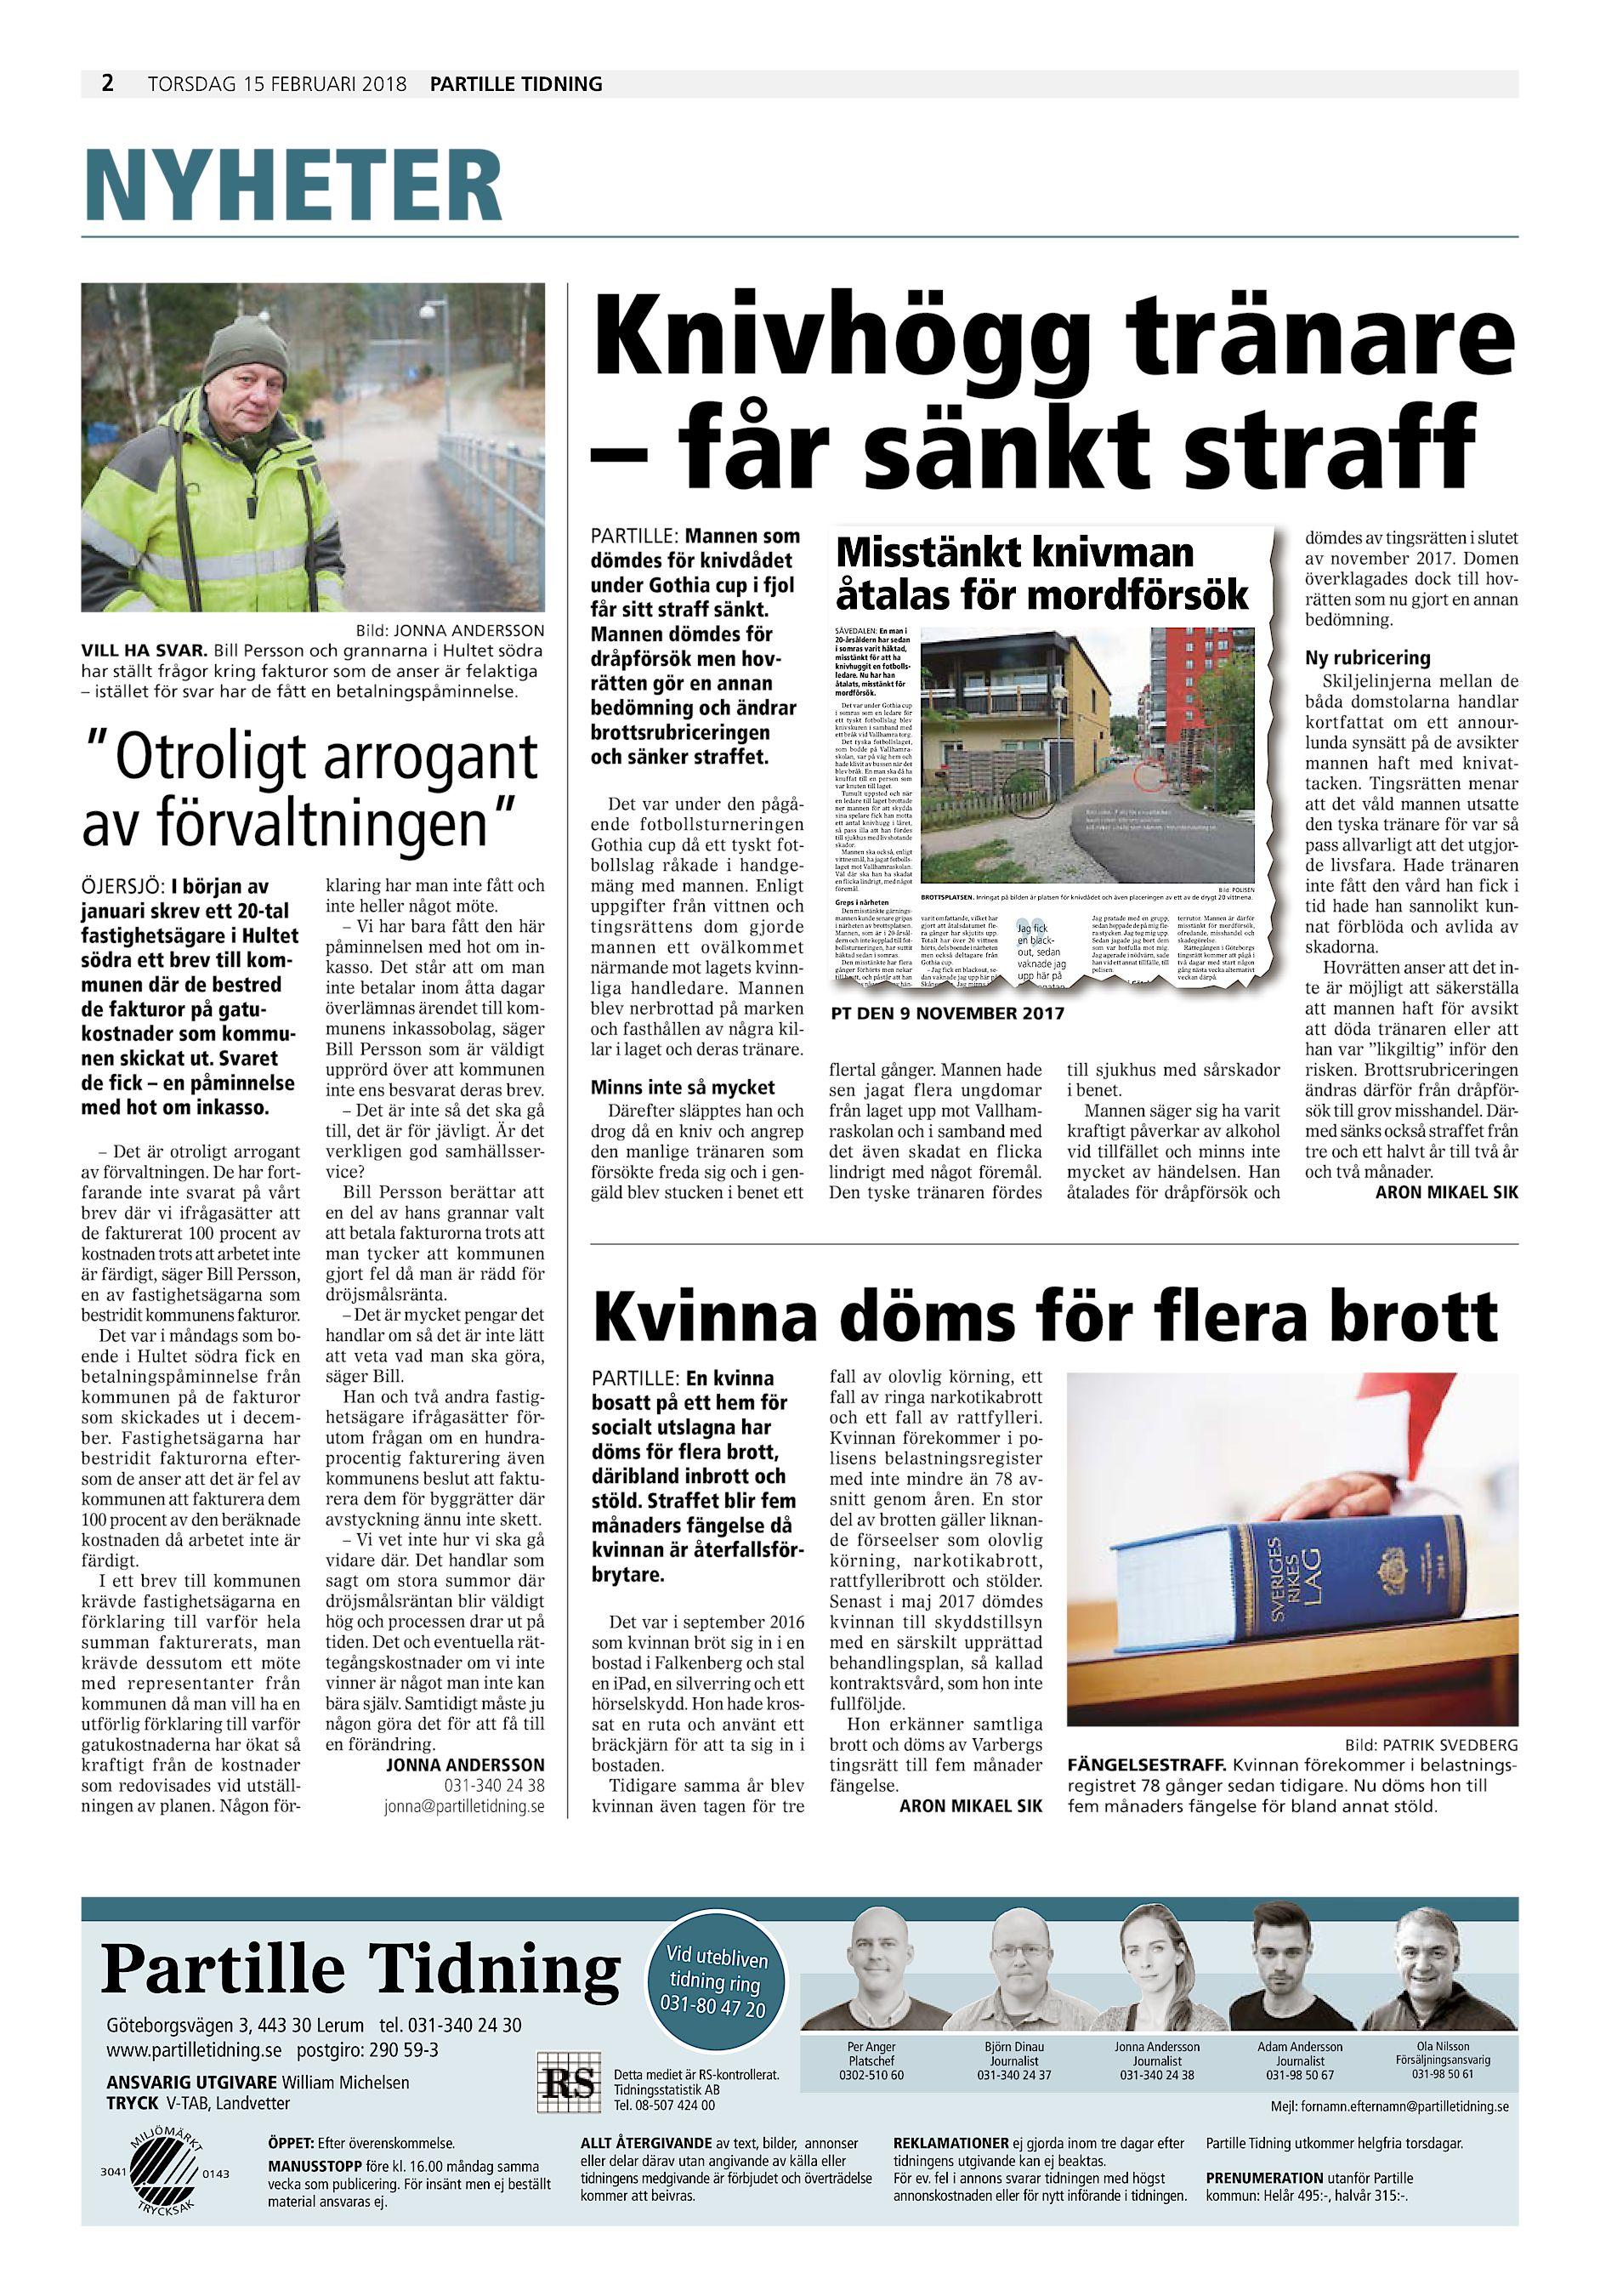 Härrydaposten / Partille Tidning PT-2018-02-15 (endast text)